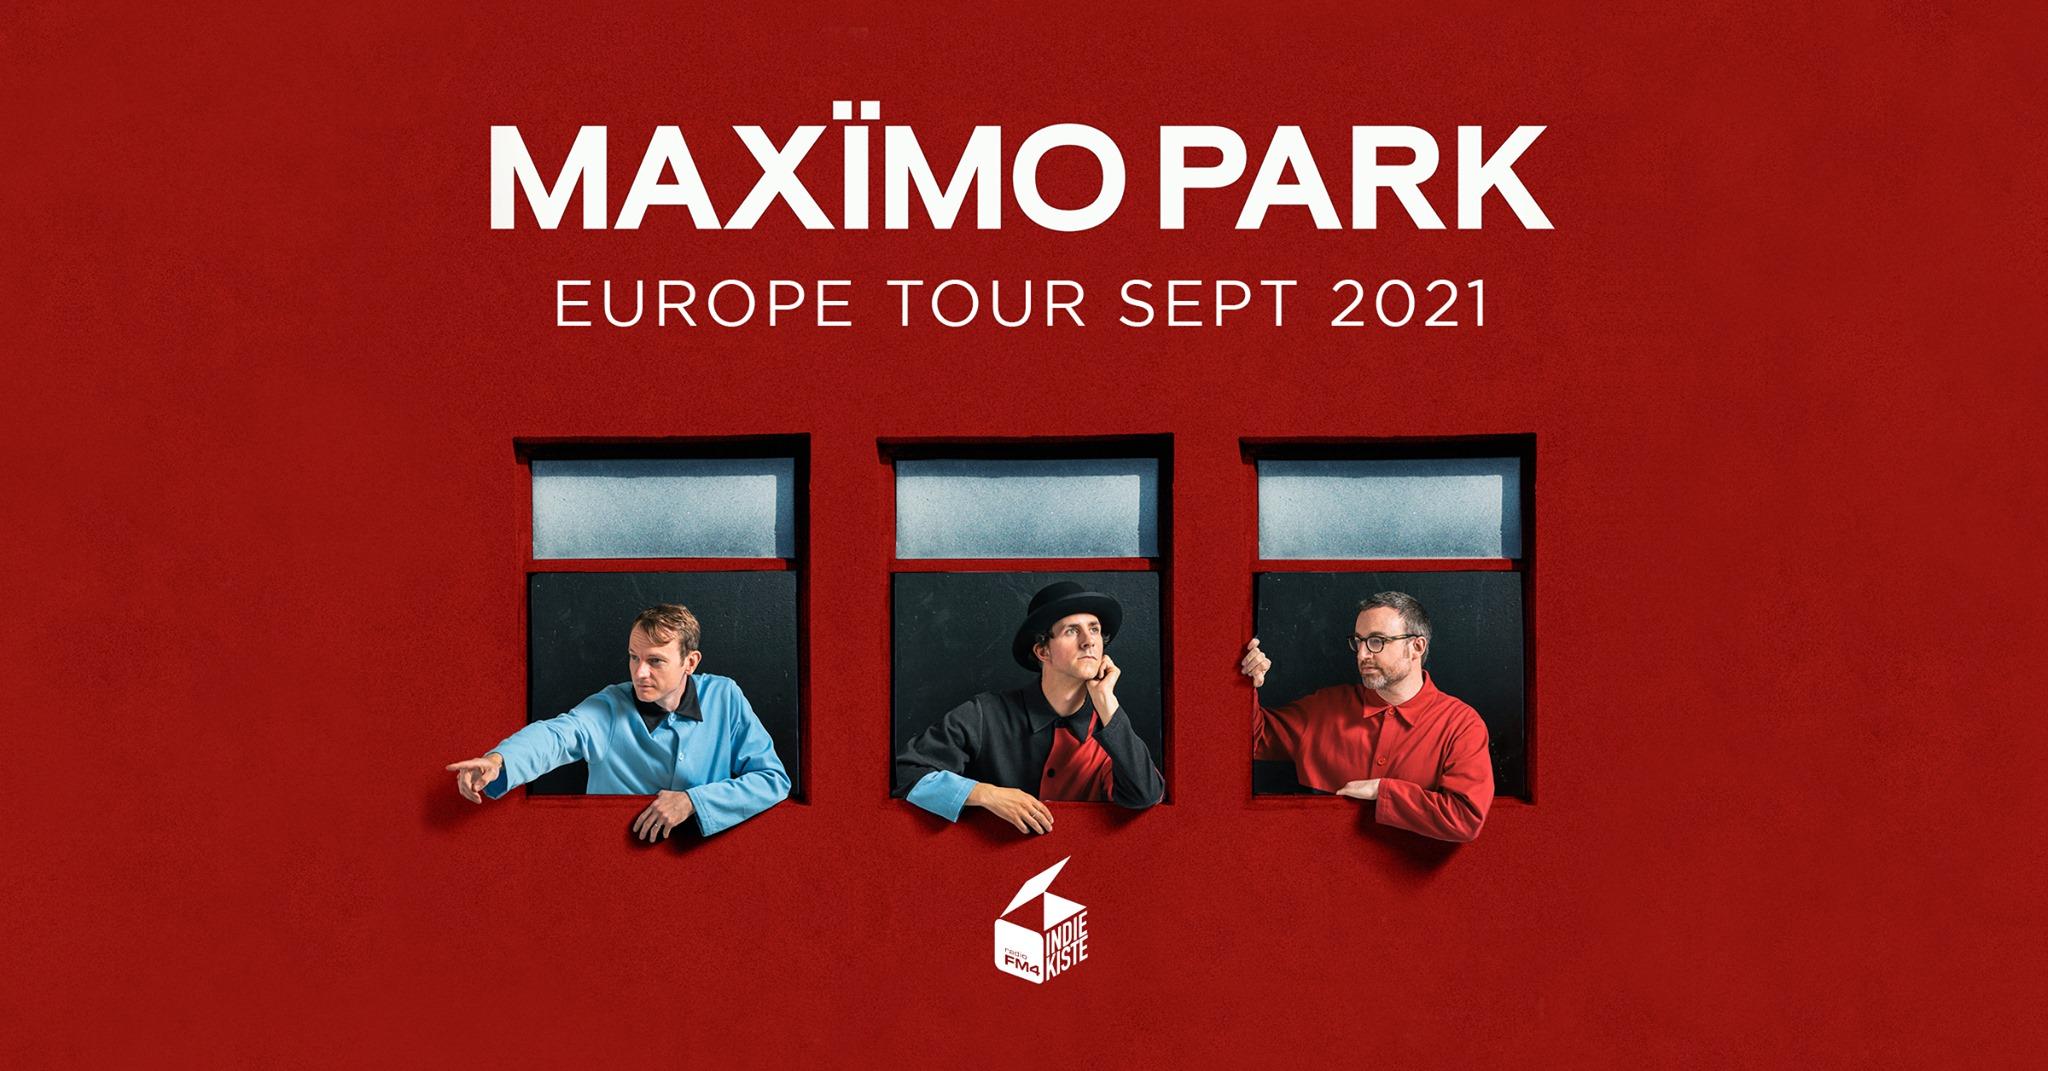 Maximo Park am 19. September 2021 @ Flex - Halle.